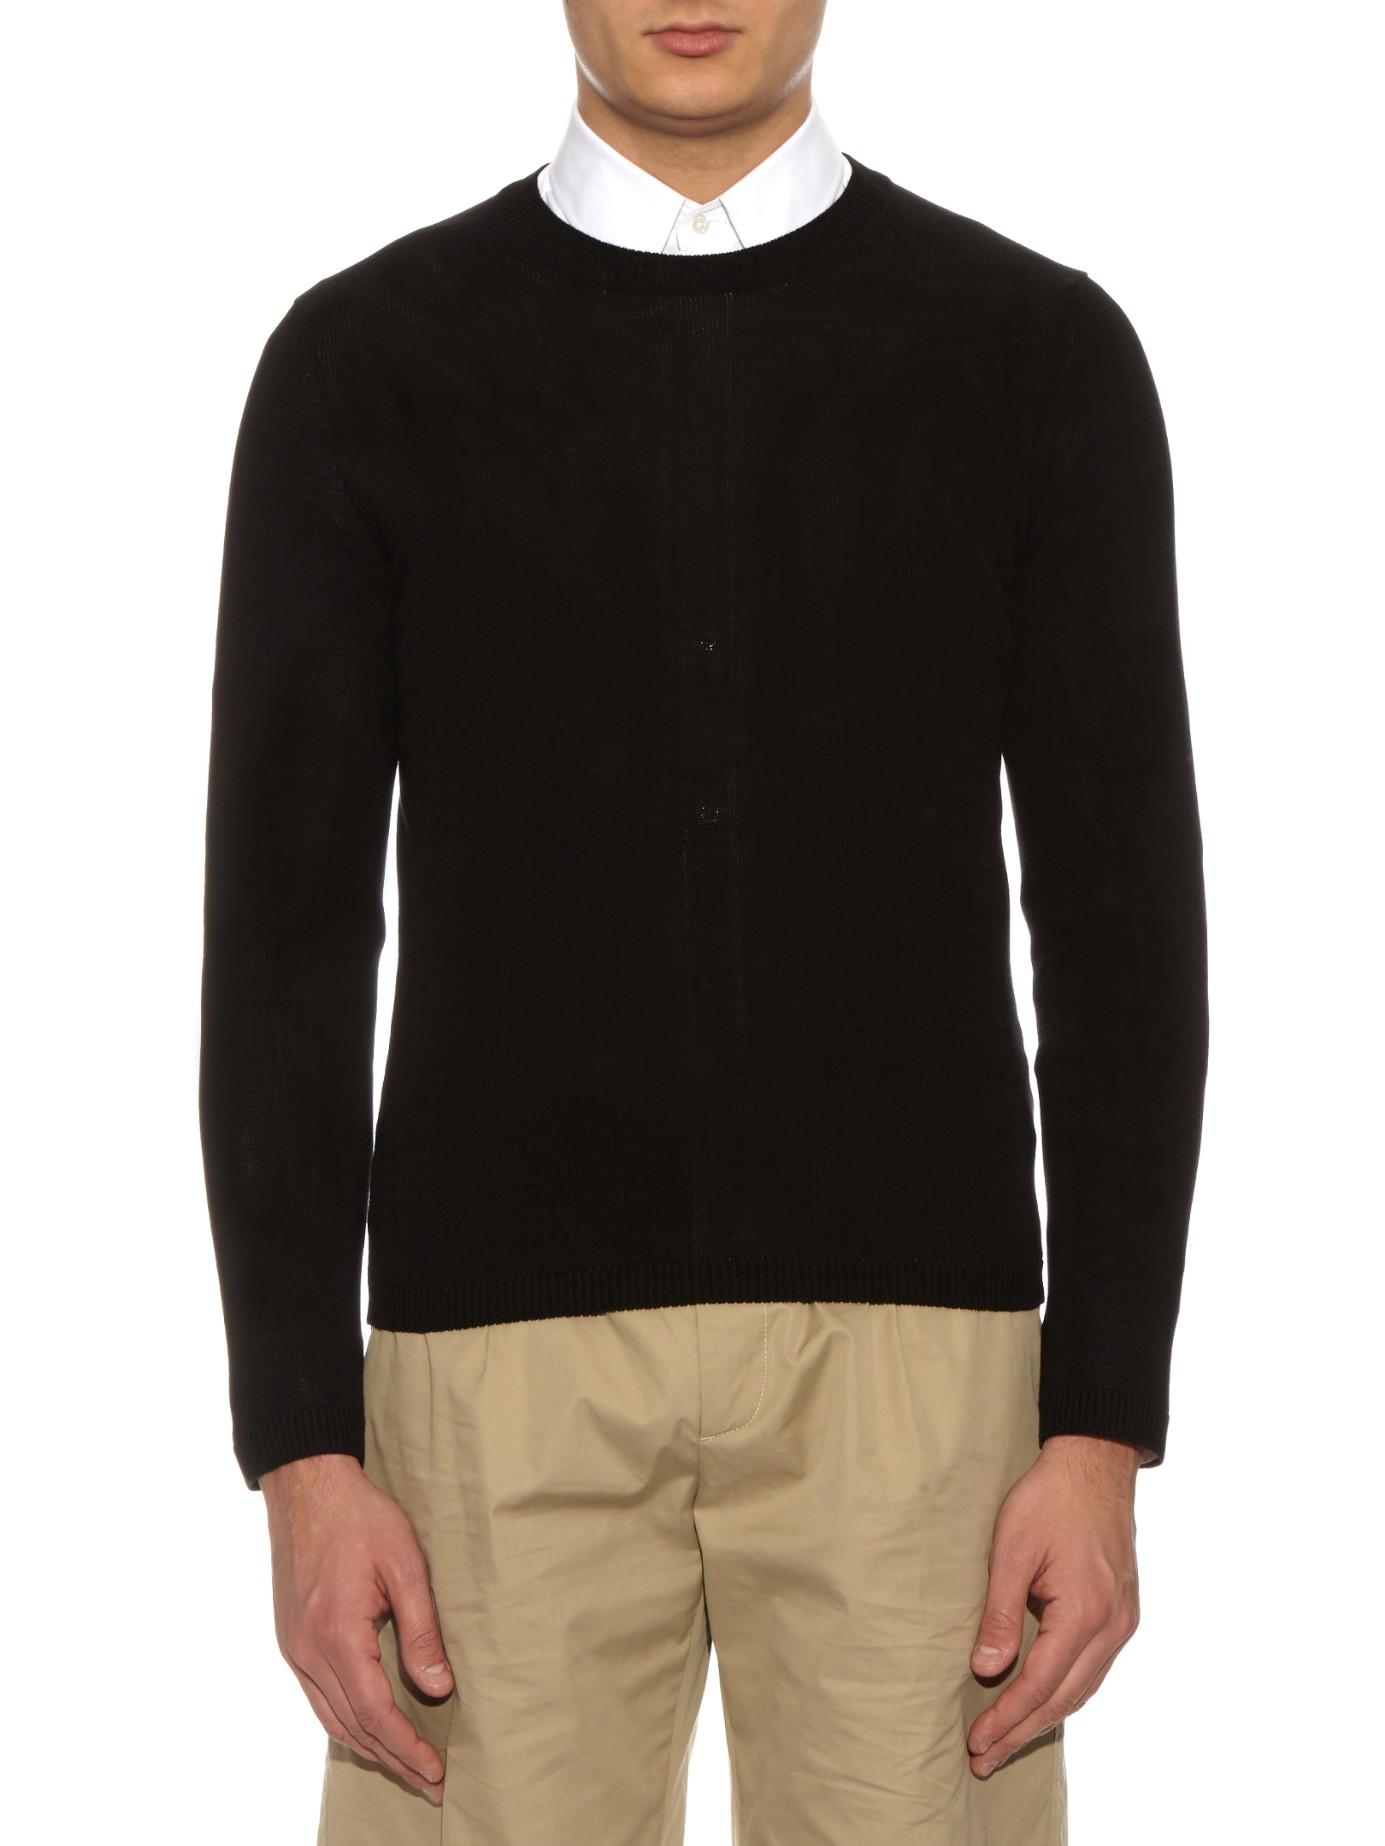 Gucci Crew-neck Cotton Sweater in Black for Men   Lyst